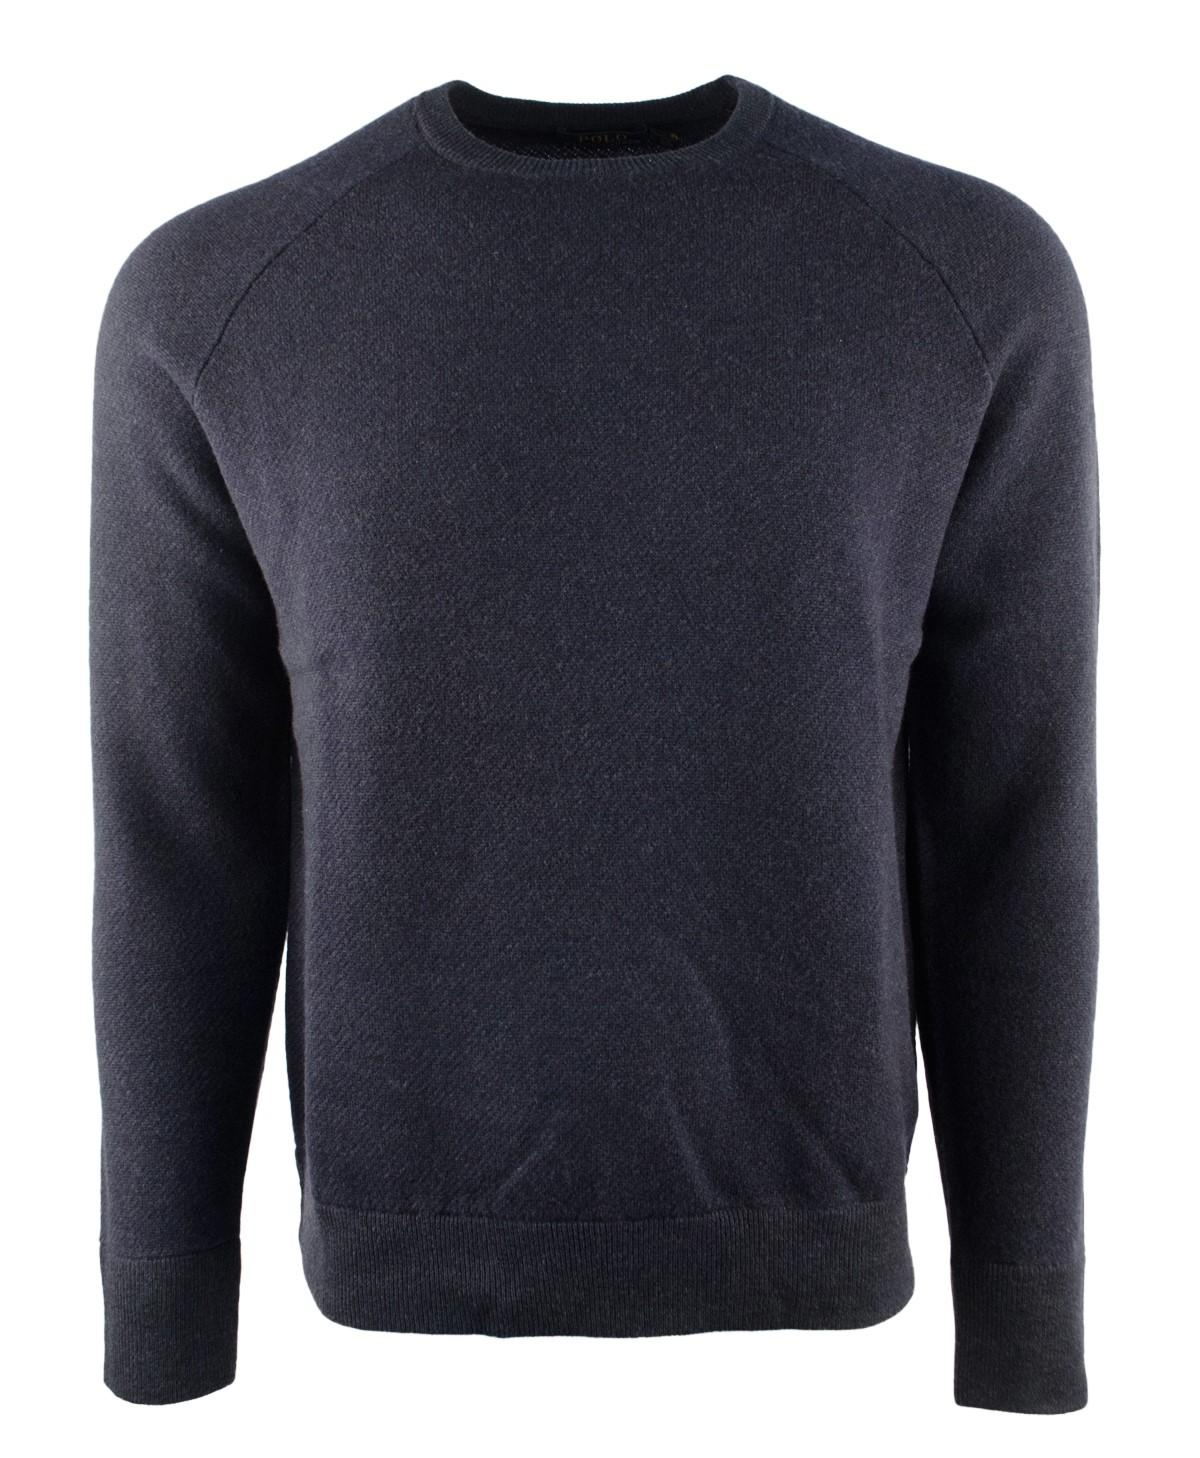 d1203c73af4 Lyst - Polo Ralph Lauren Merino Wool Crewneck Sweater in Blue for Men